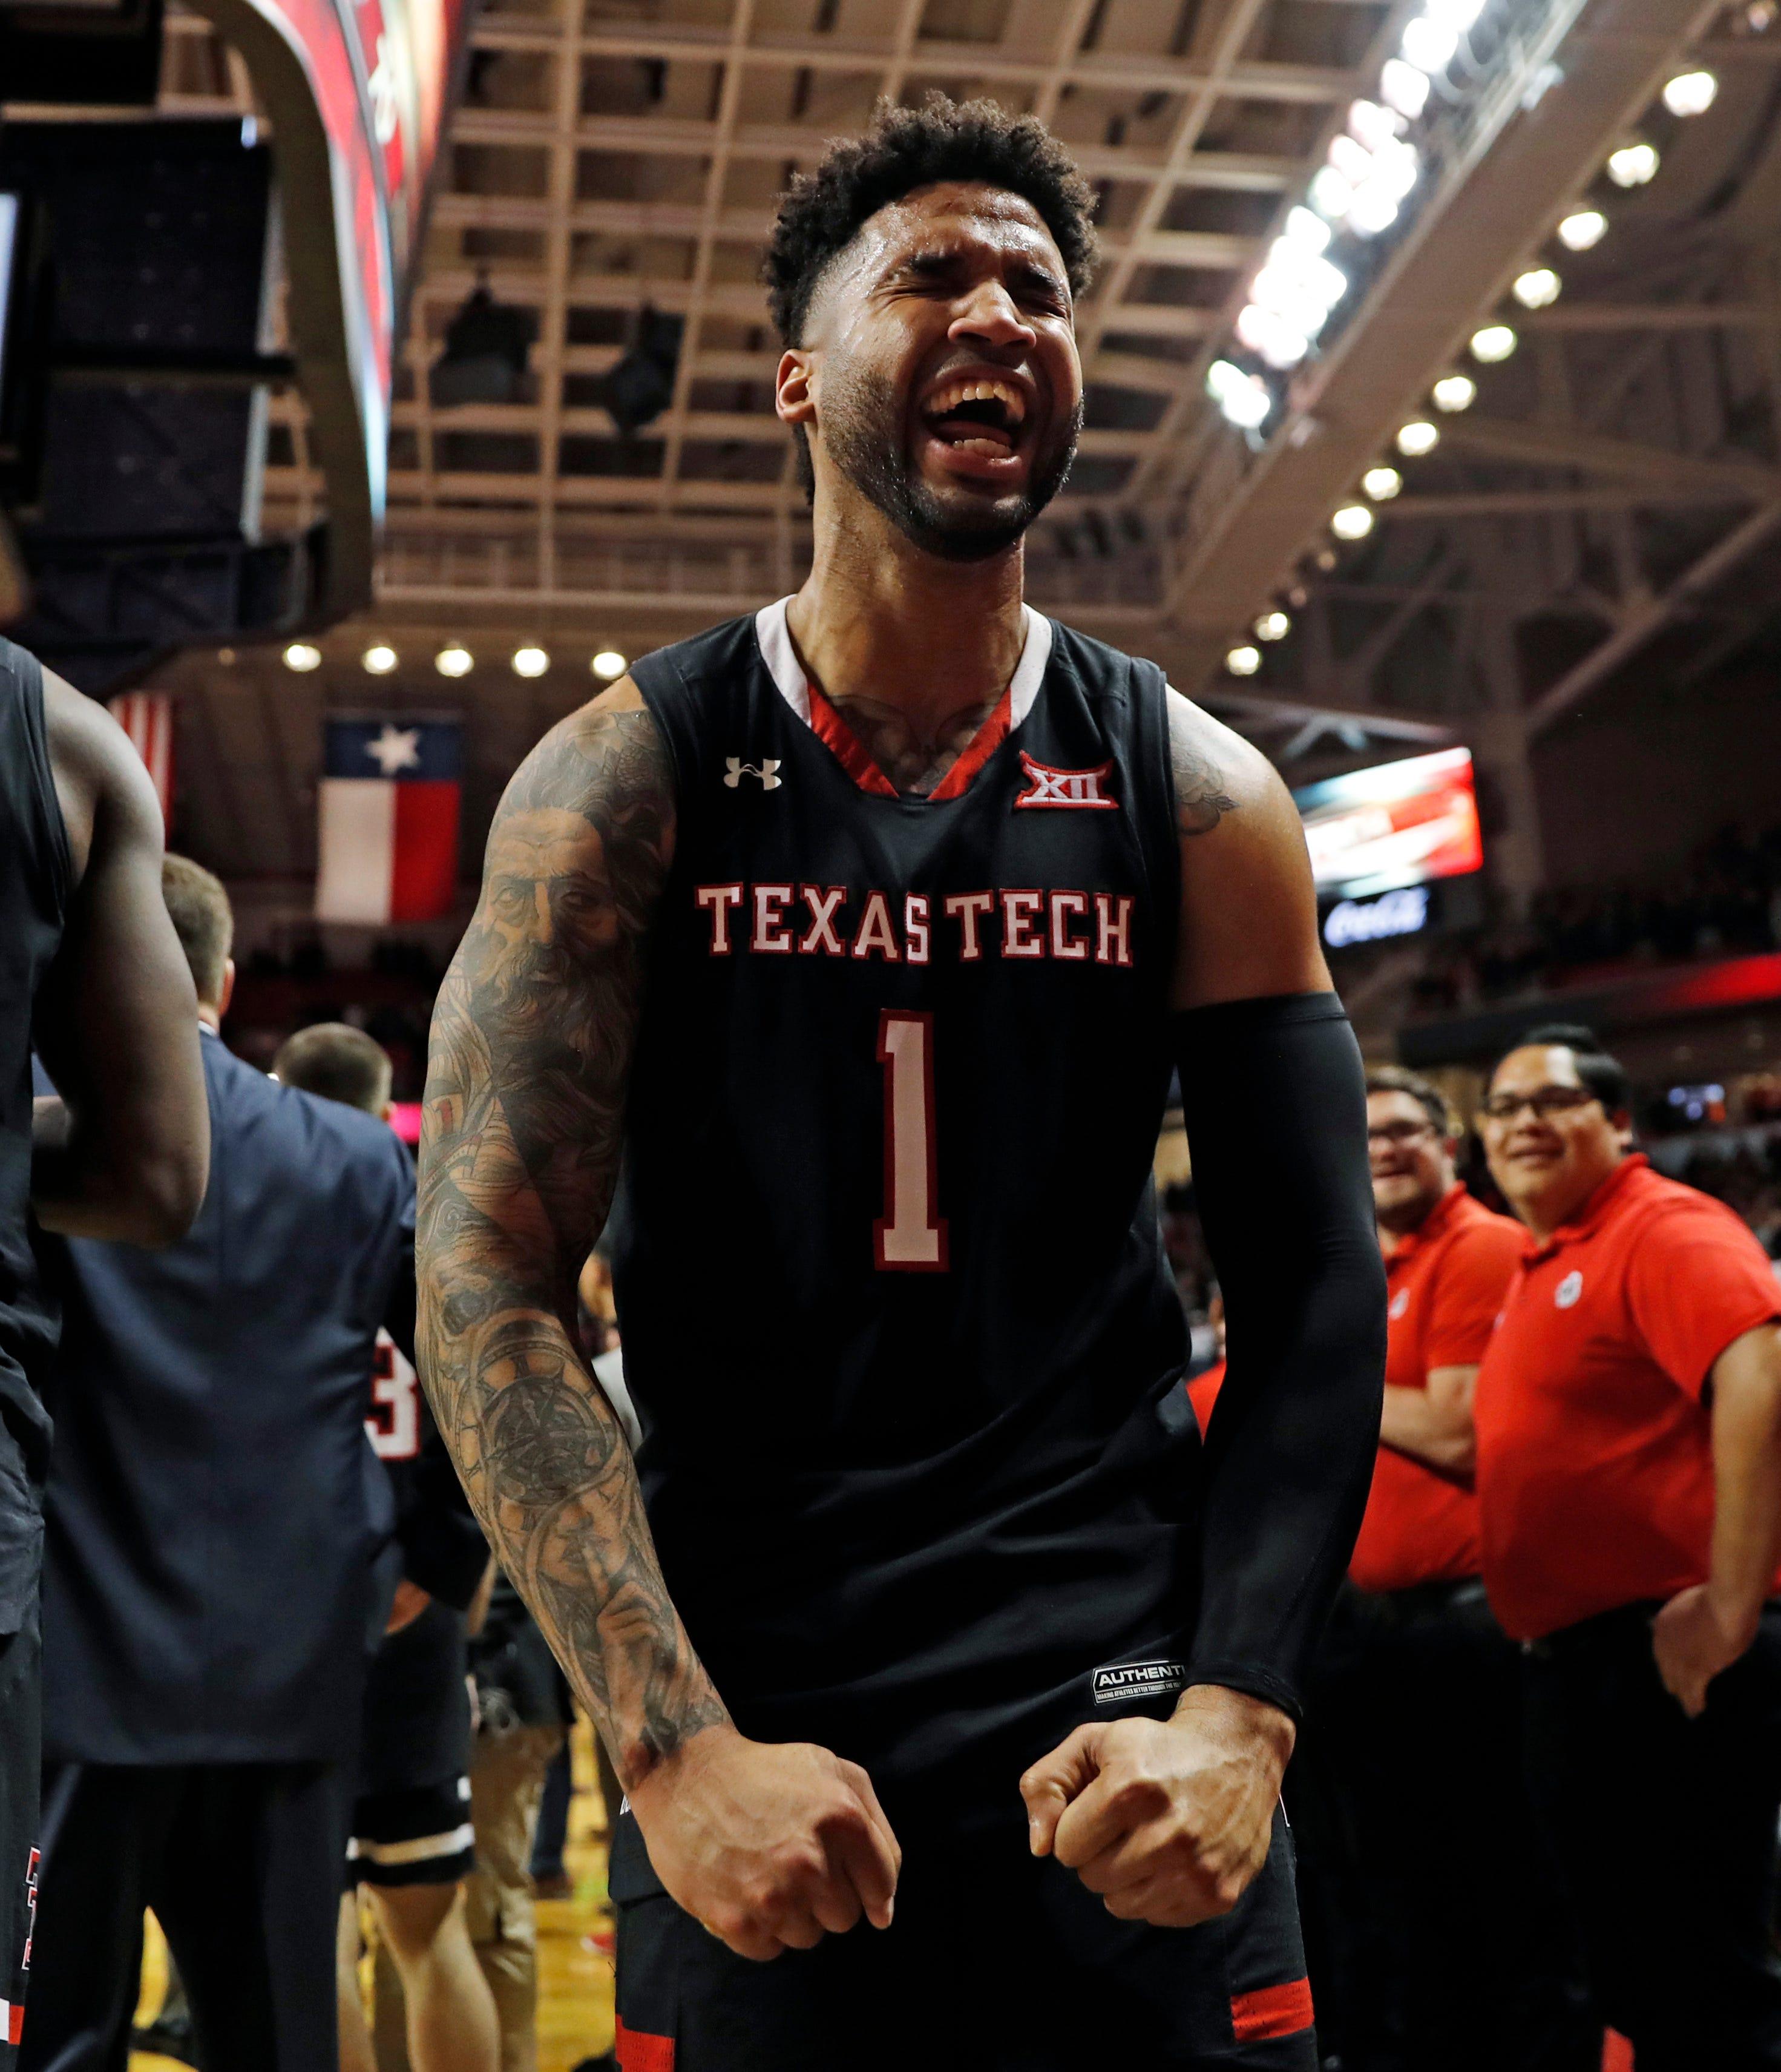 Big 12 Basketball: No. 8 Texas Tech dominant again at home over Texas